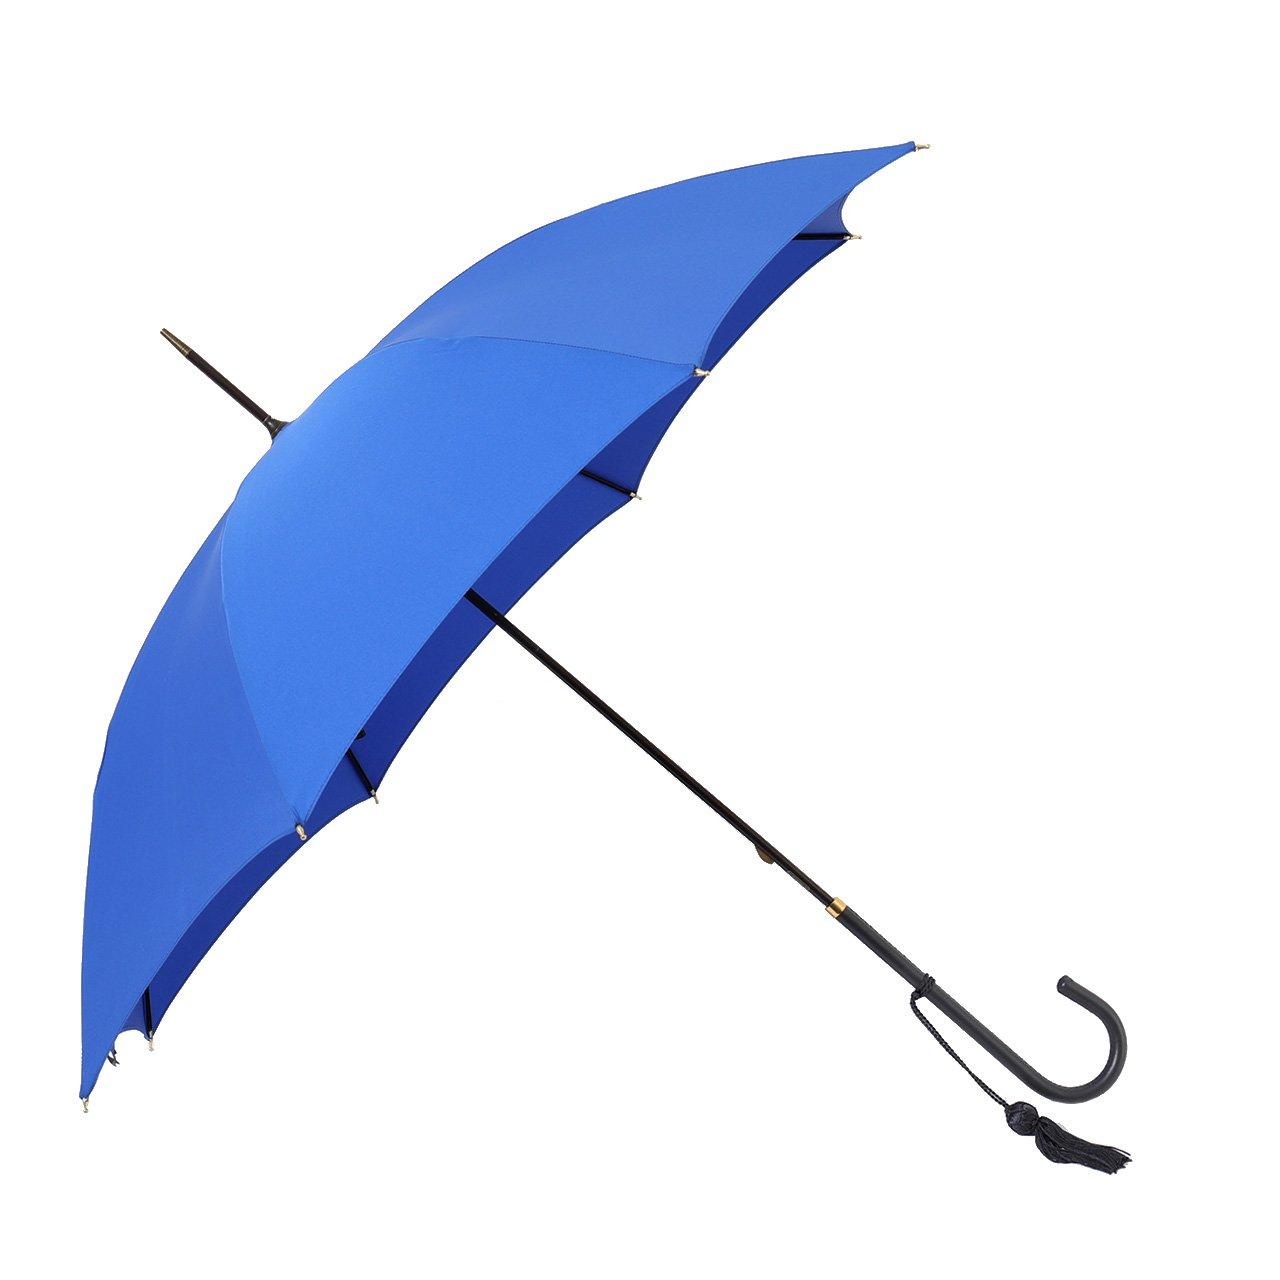 FOX UMBRELLAS フォックスアンブレラ WL1 SLIM LEATHER 細革巻 ハンドル 雨傘 パラソル 雨具 タッセルチャーム付き カラ [並行輸入品] B07BQRCT4C /|545/ROYAL-BLUE 545/ROYAL-BLUE /